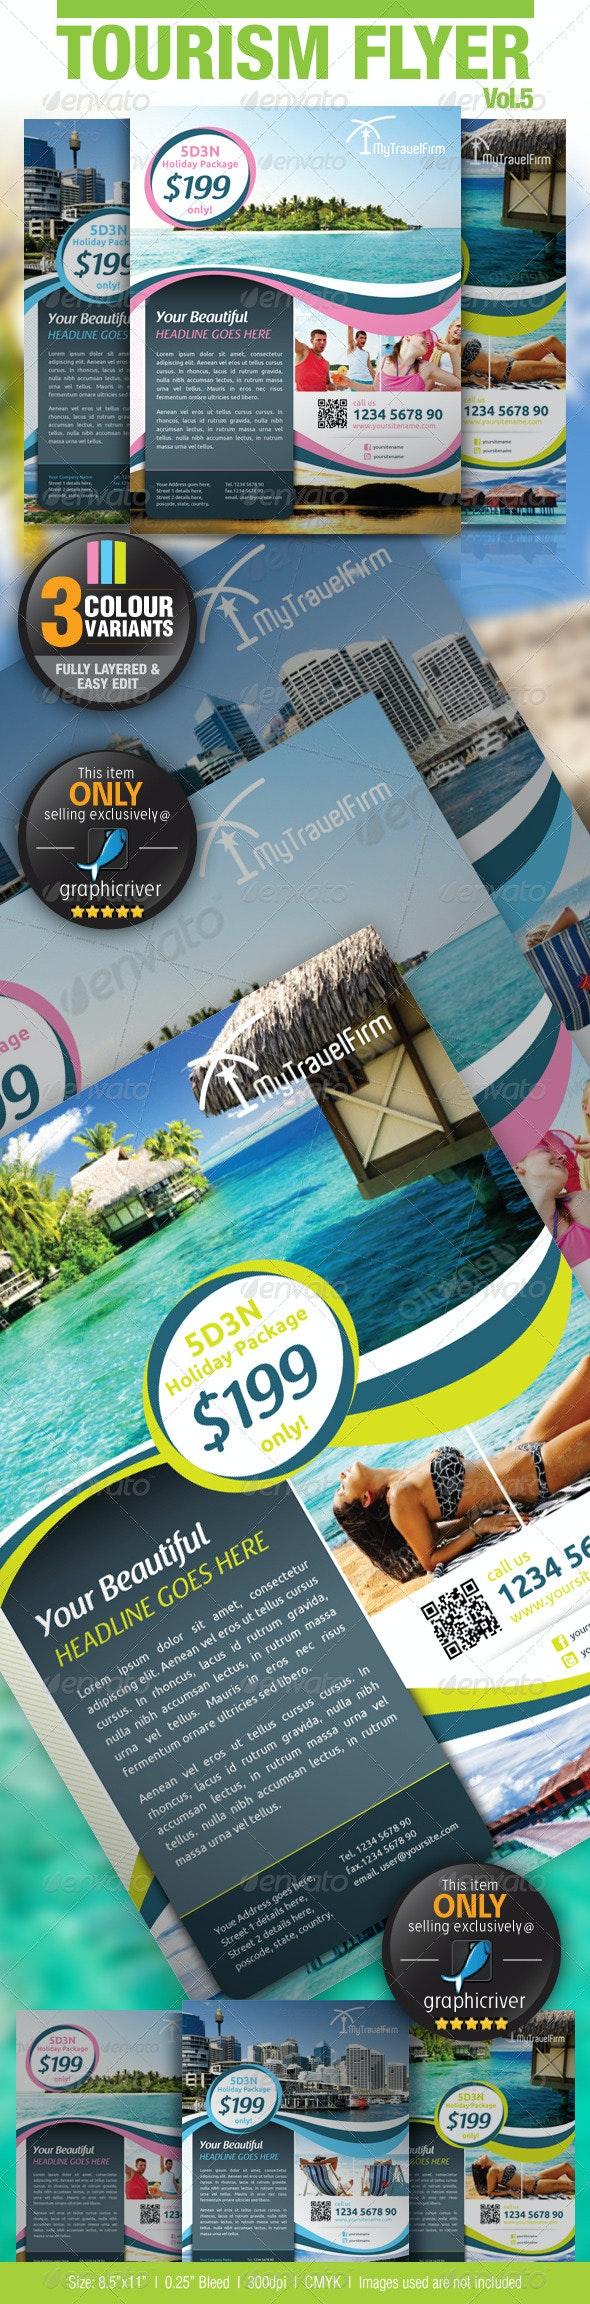 Tourism Flyer Vol.5 - Holidays Events